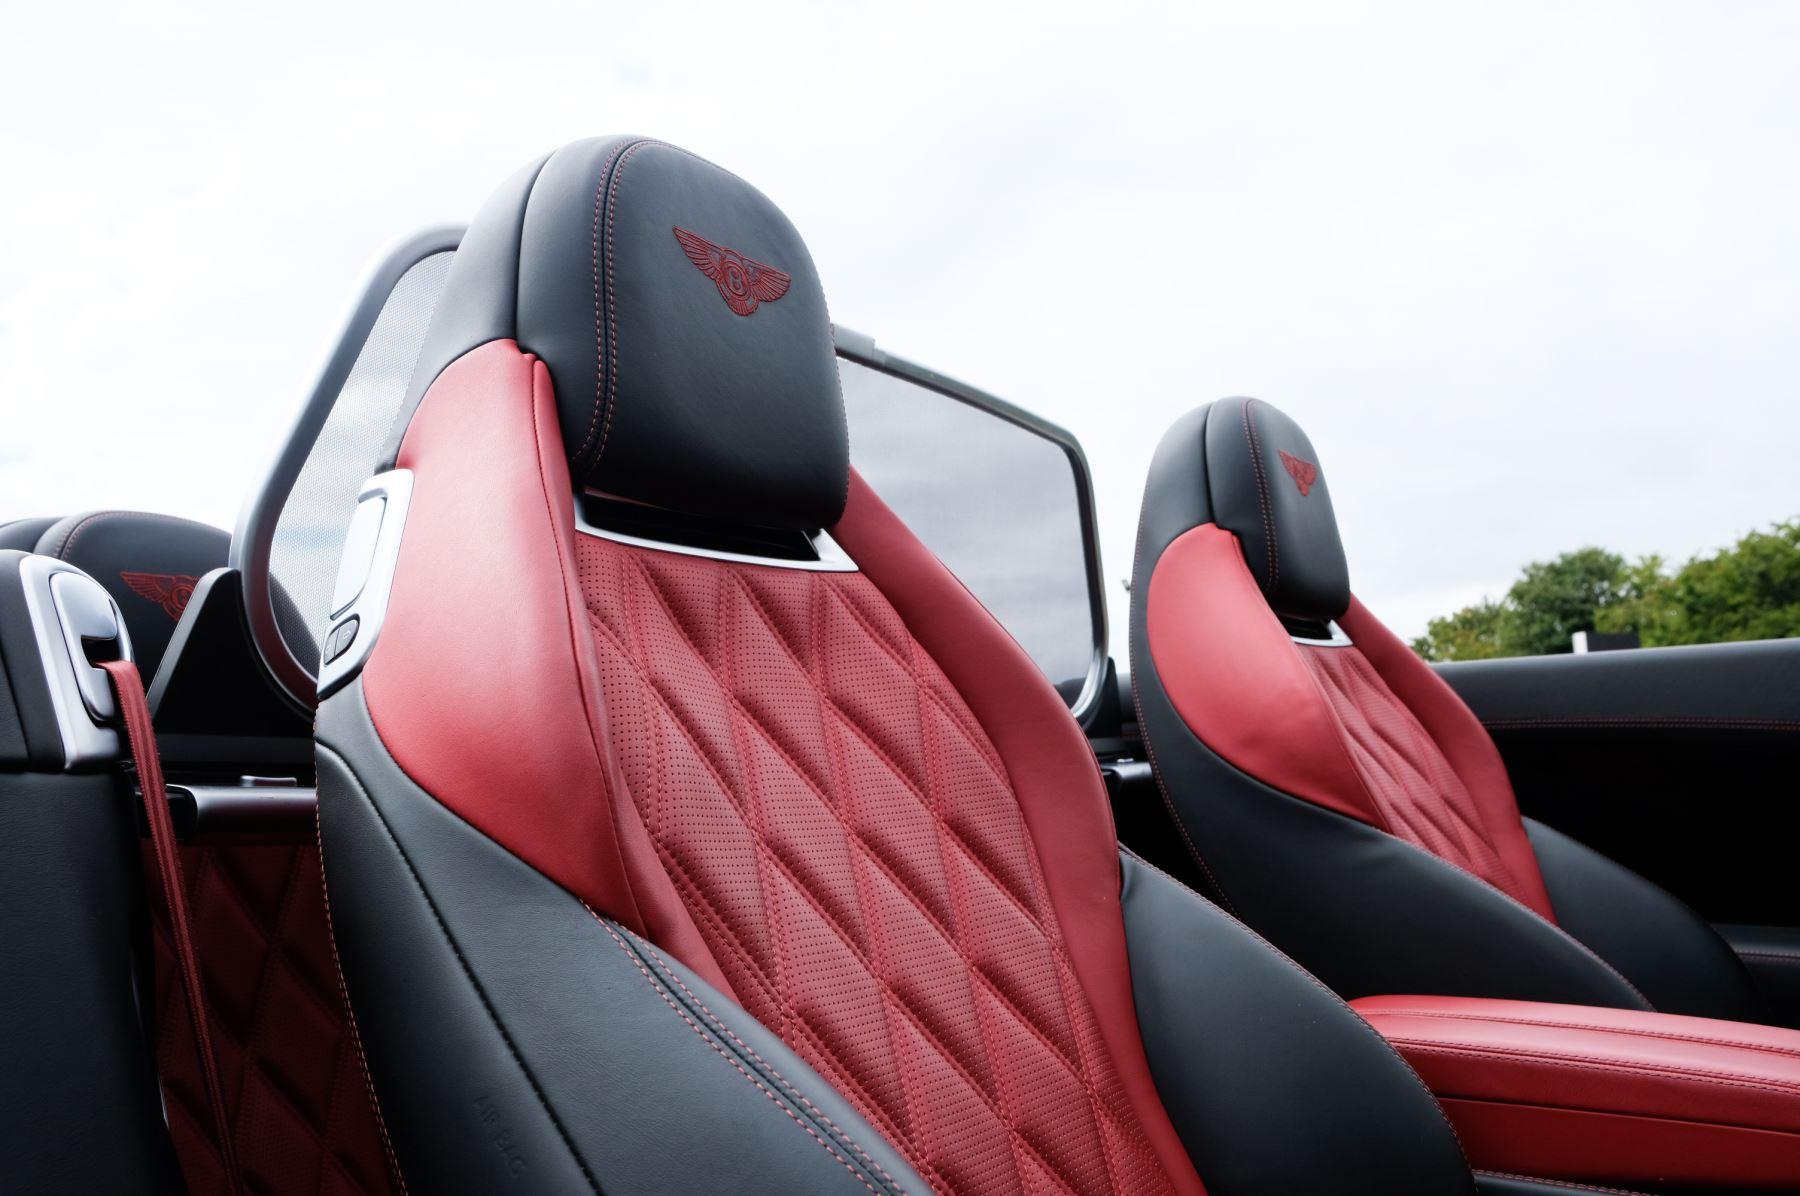 Bentley Continental GTC 6.0 W12 Speed - Massage Seats & Ventilation - Neck Warmer - Rear View Camera image 13